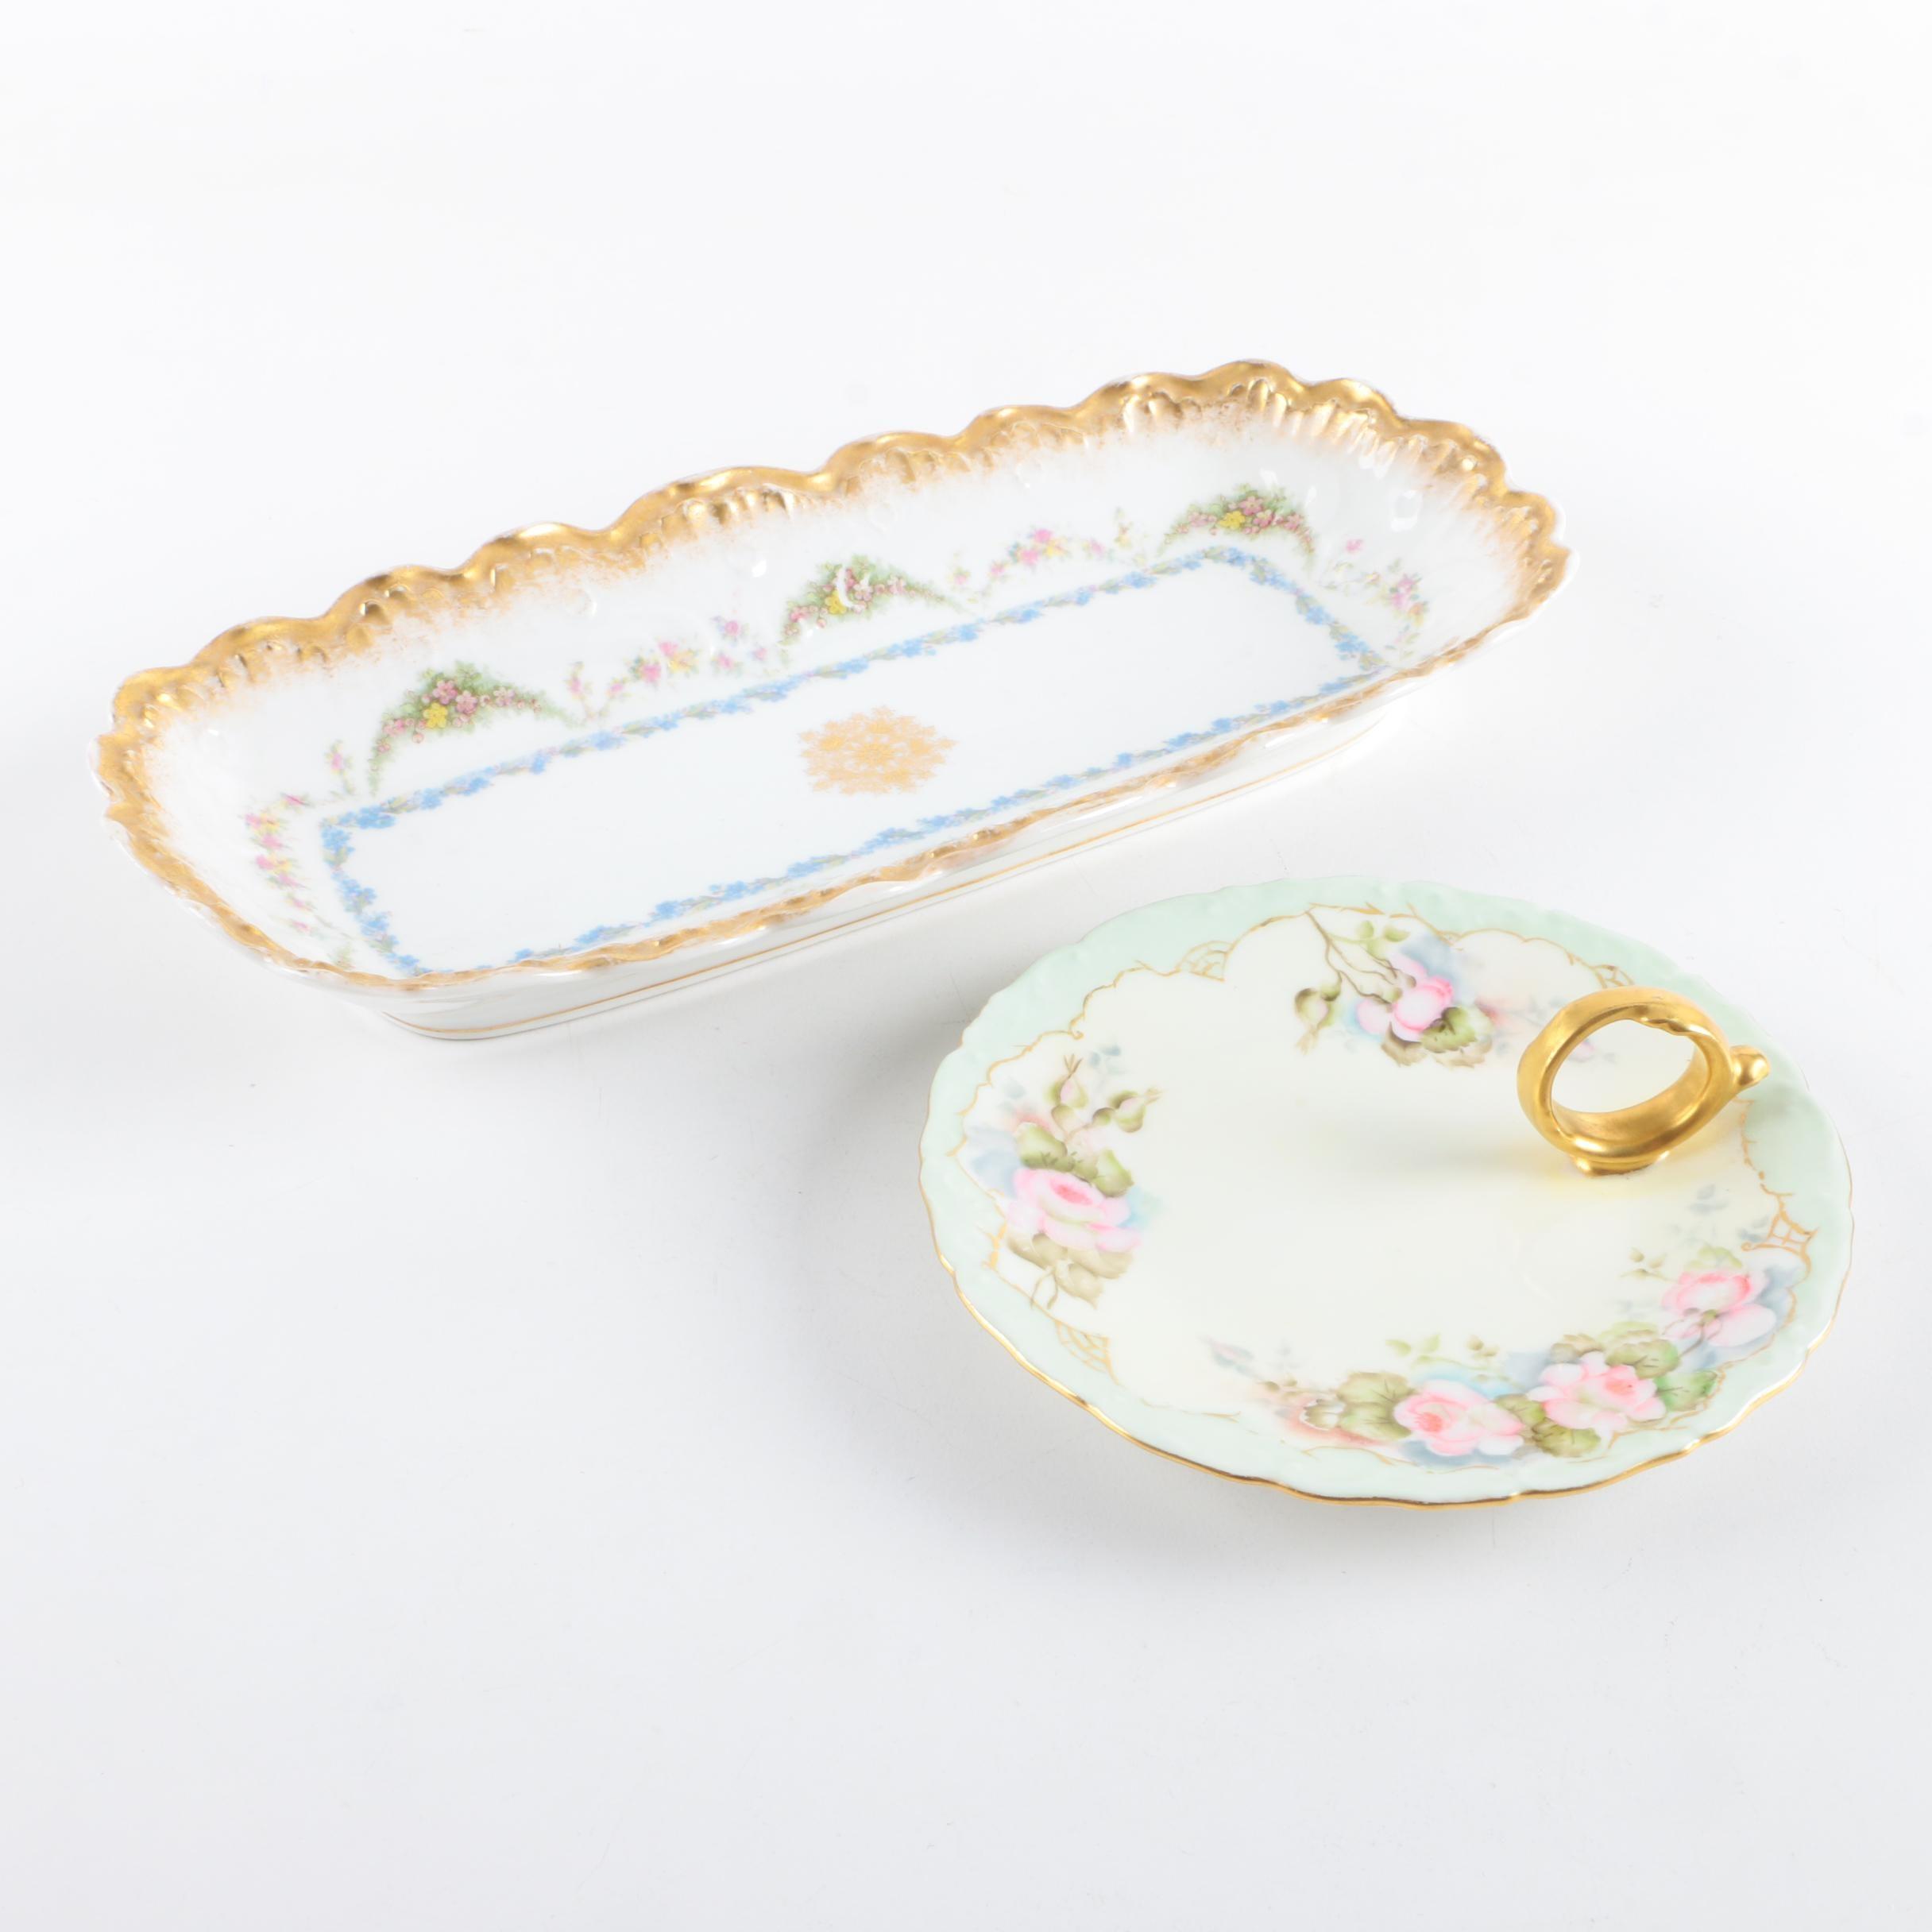 Antique Porcelain Tableware